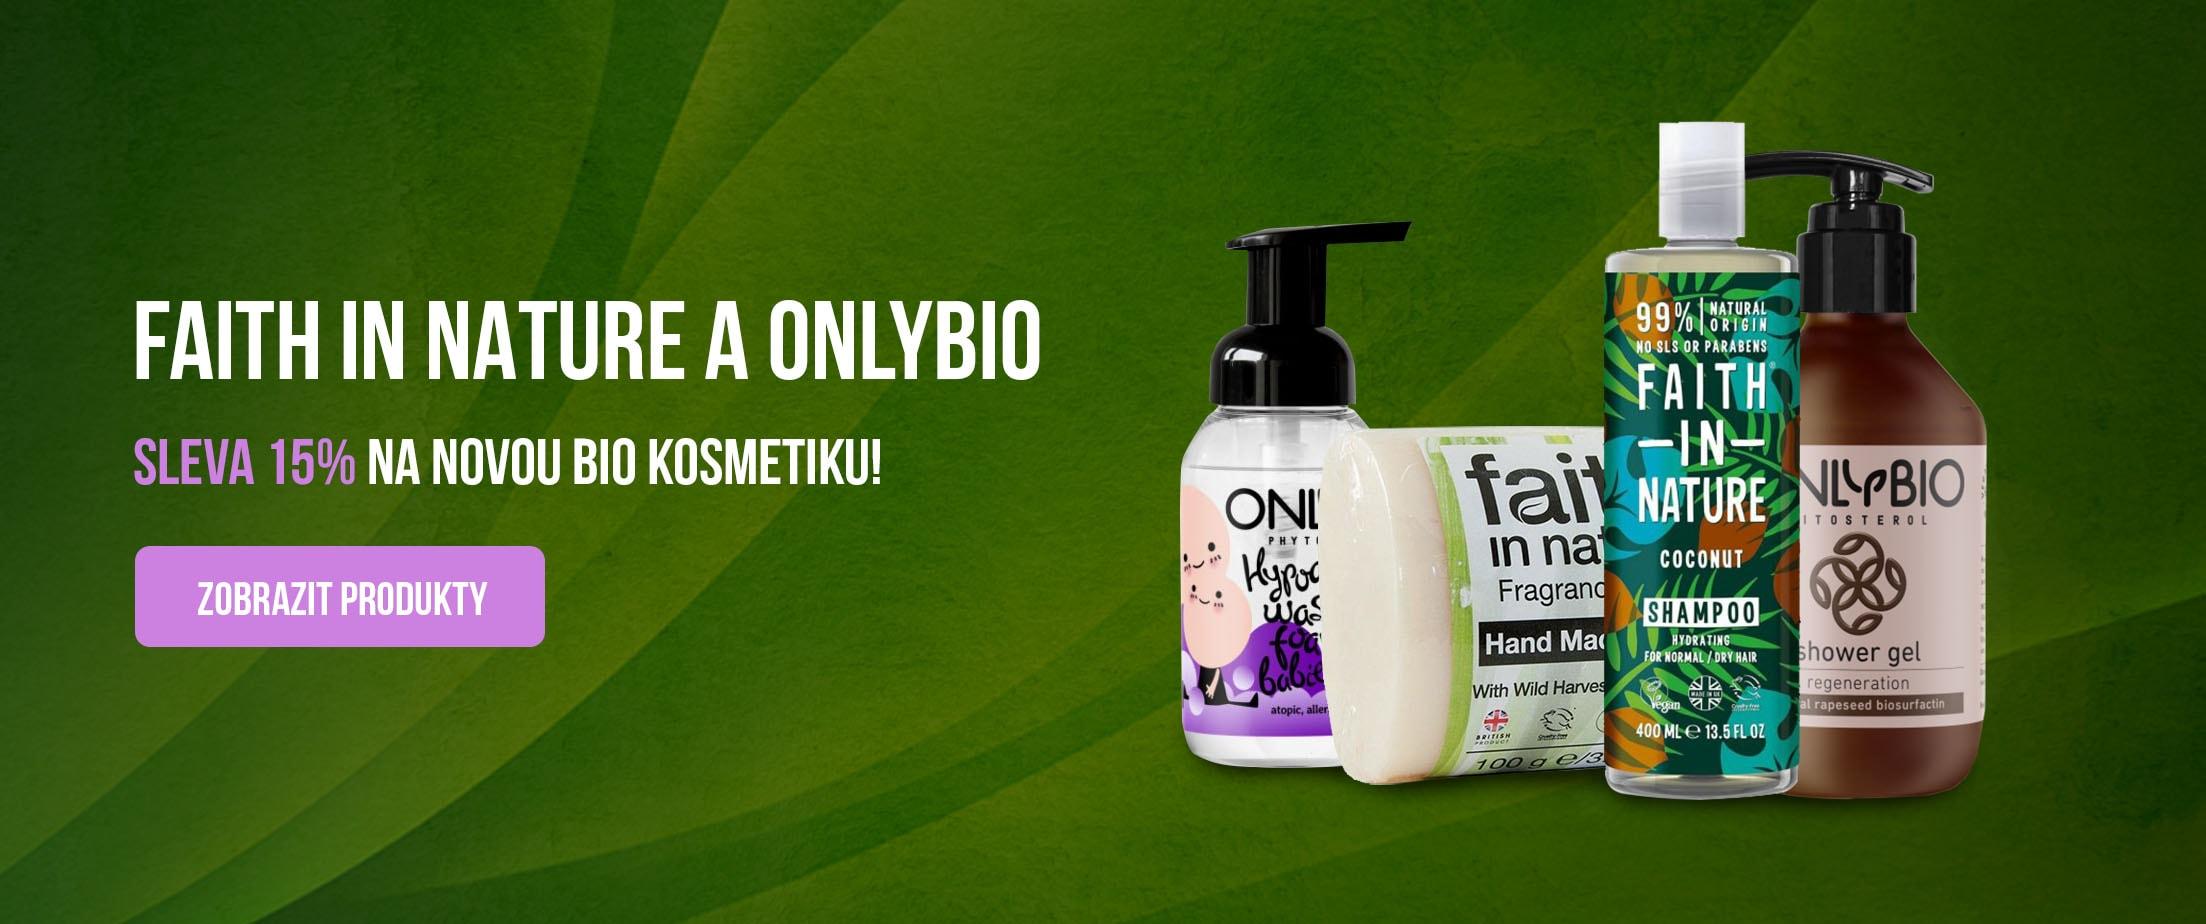 only-bio-fin-banner-pc